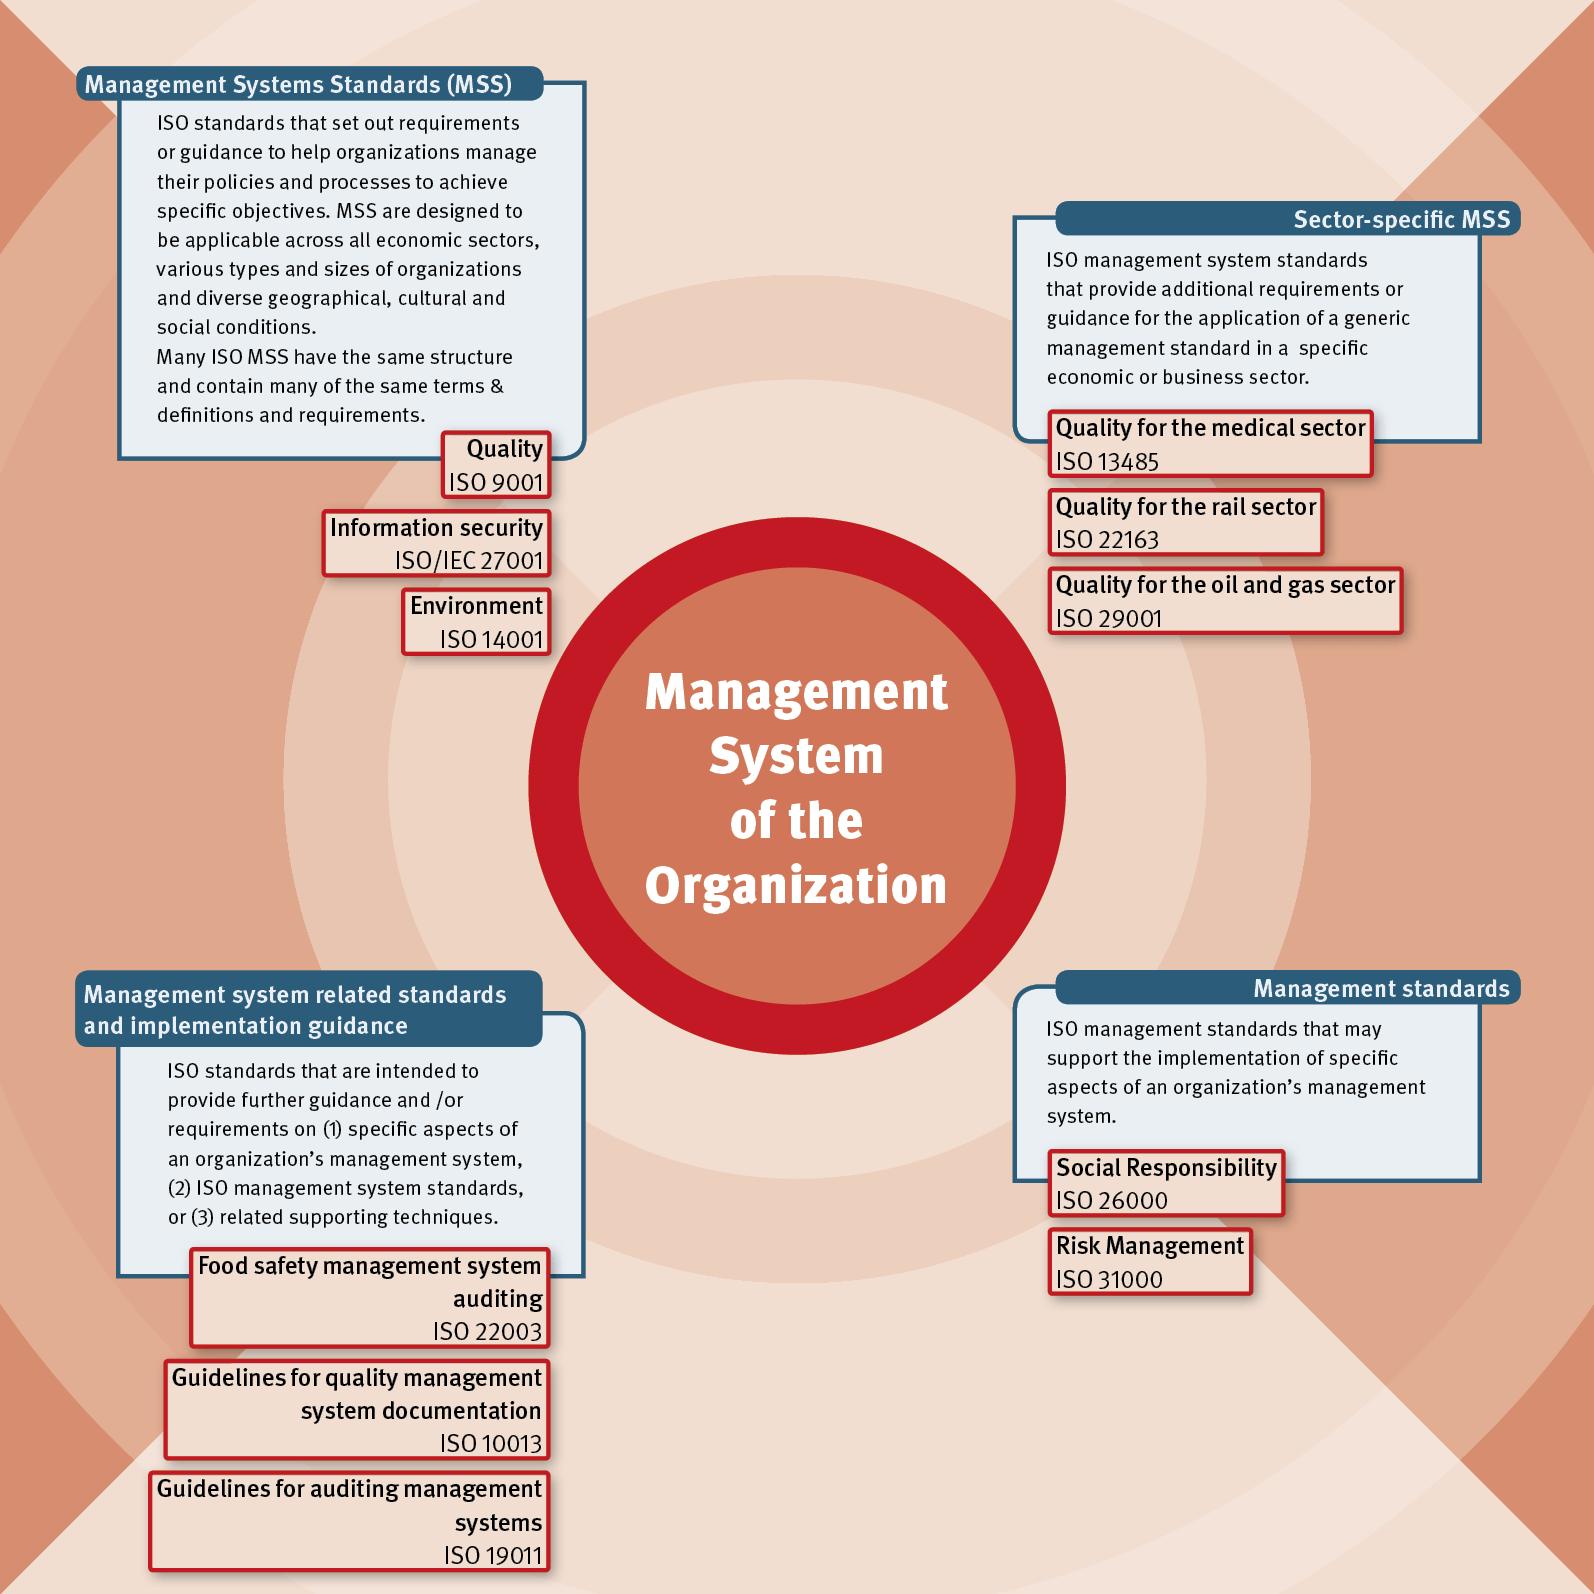 hight resolution of management standards management systems standards and related standards